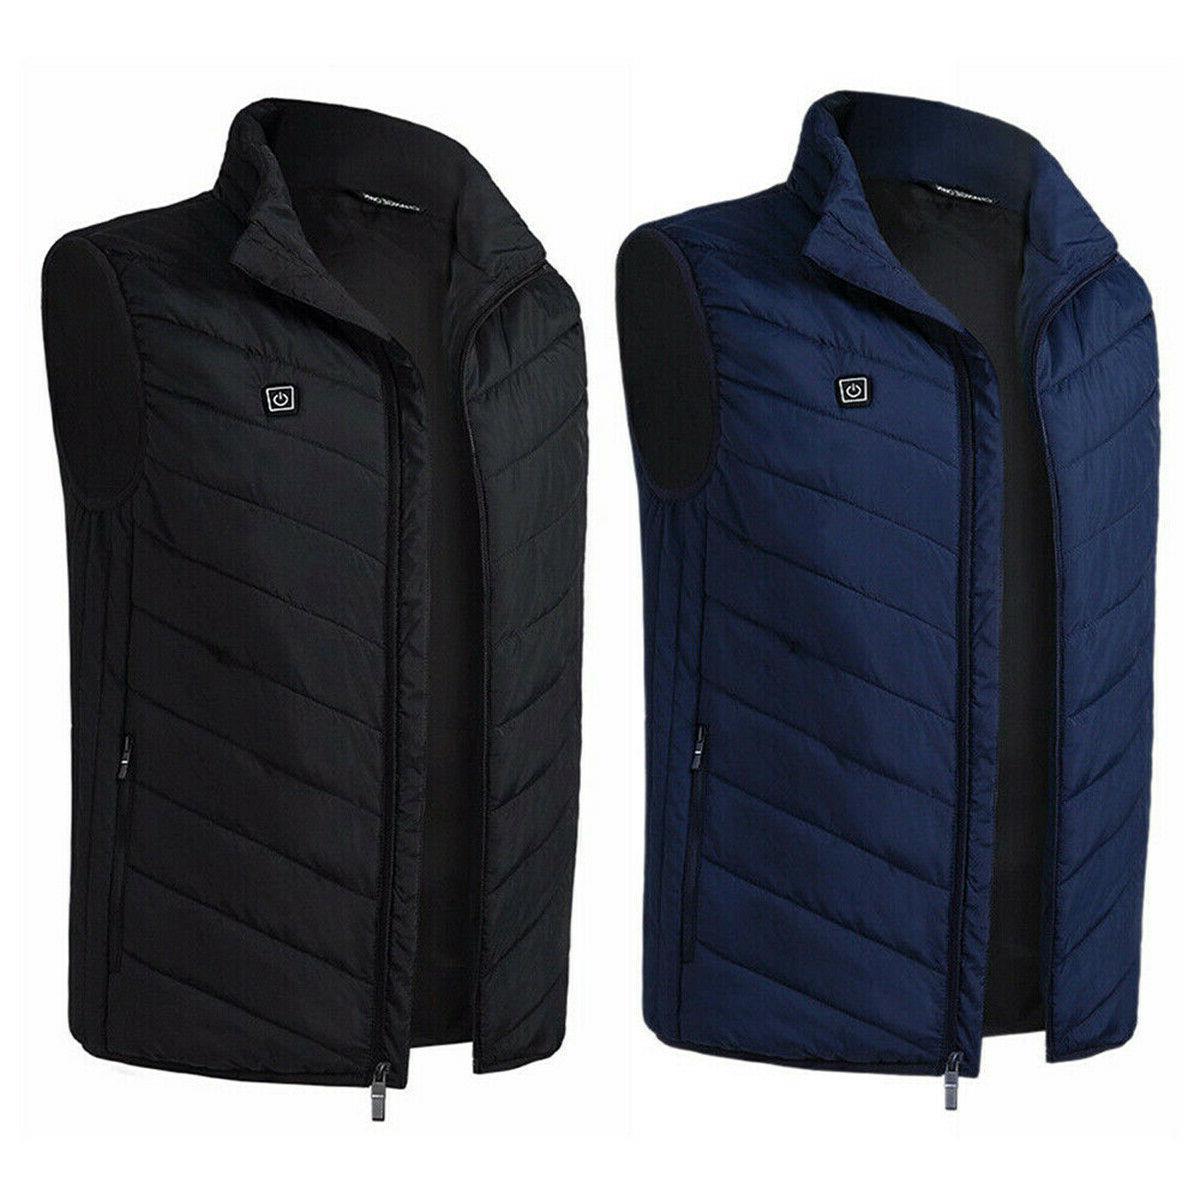 Electric USB Jacket Coat Heating Body Warmer